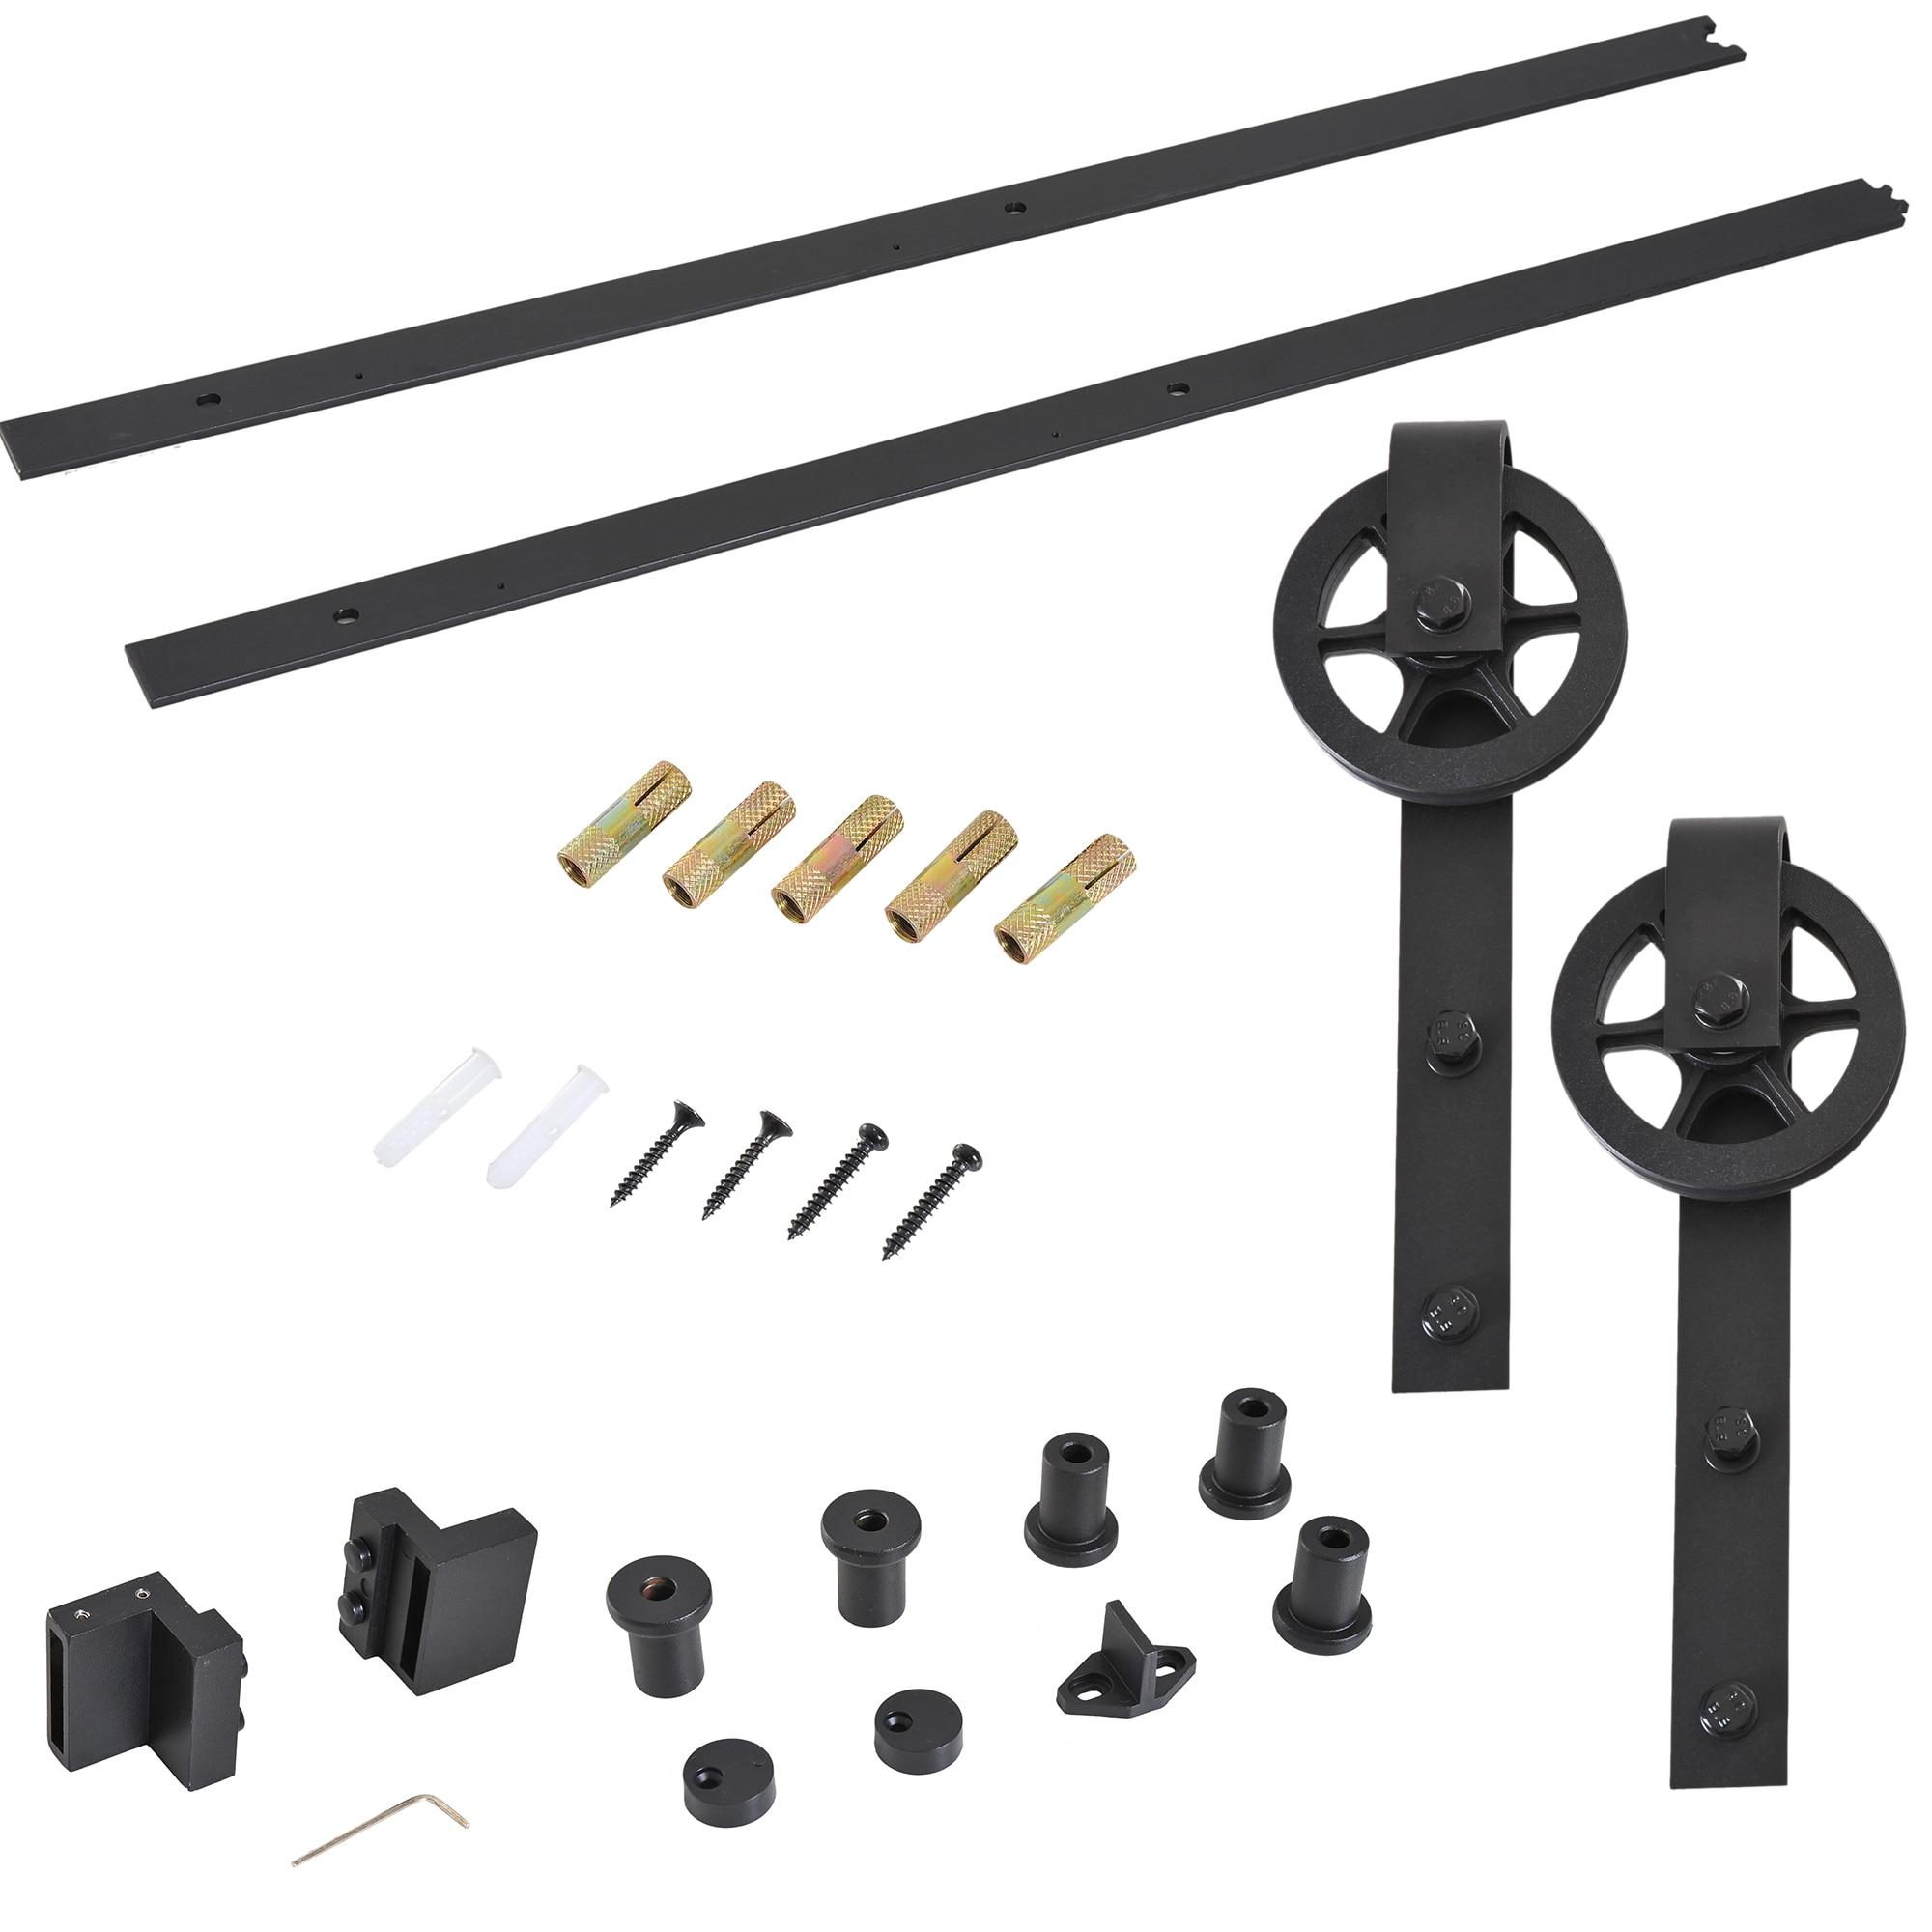 HOMCOM Set Accessories Track Thickness 34-40mm For Installation Sliding Door Steel Black